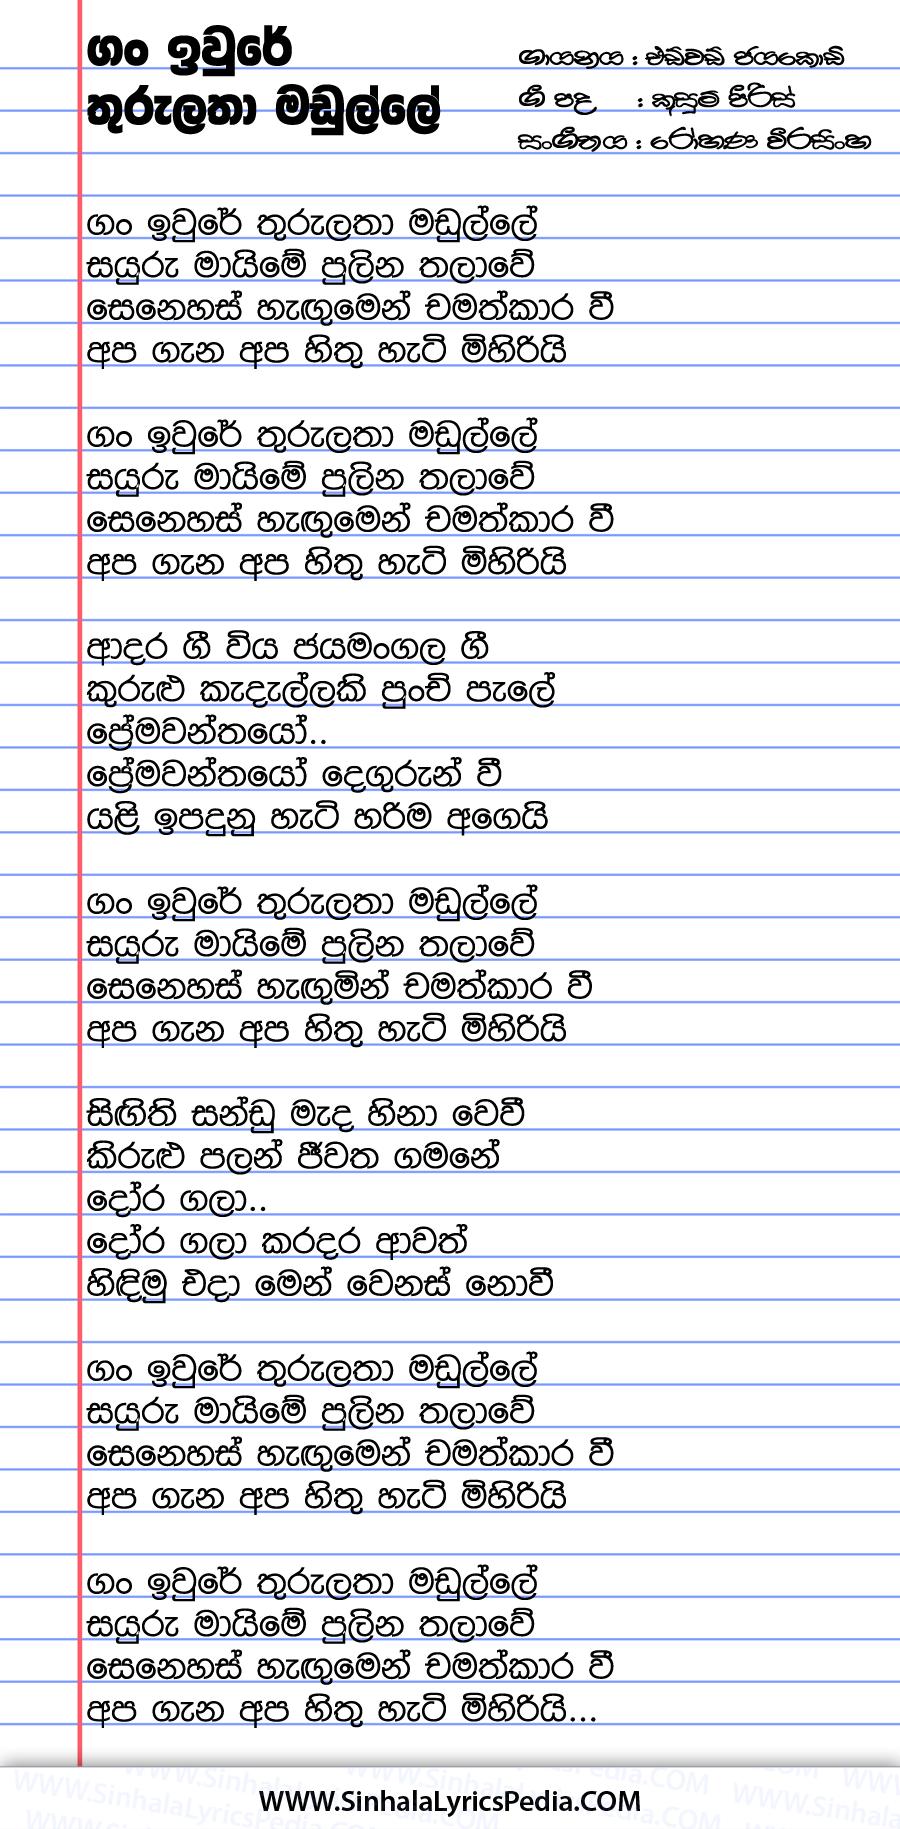 Gan Iwure Thuru Latha Madulle Song Lyrics